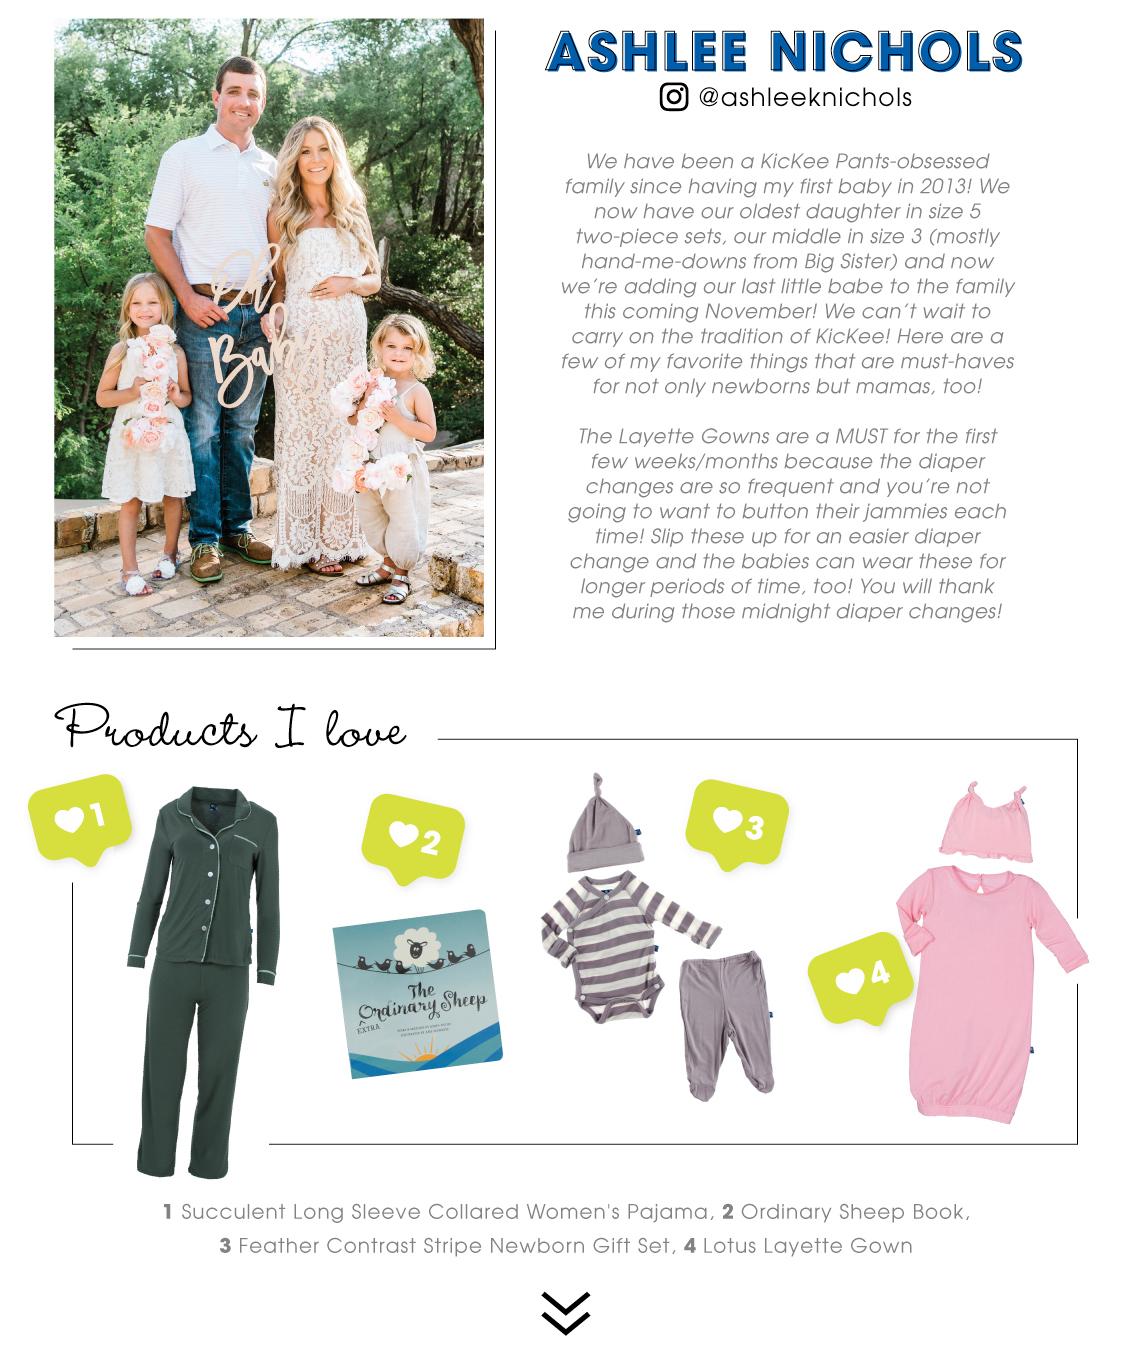 Baby-Registry-Giveaway-Campaign_Blog_02.jpg